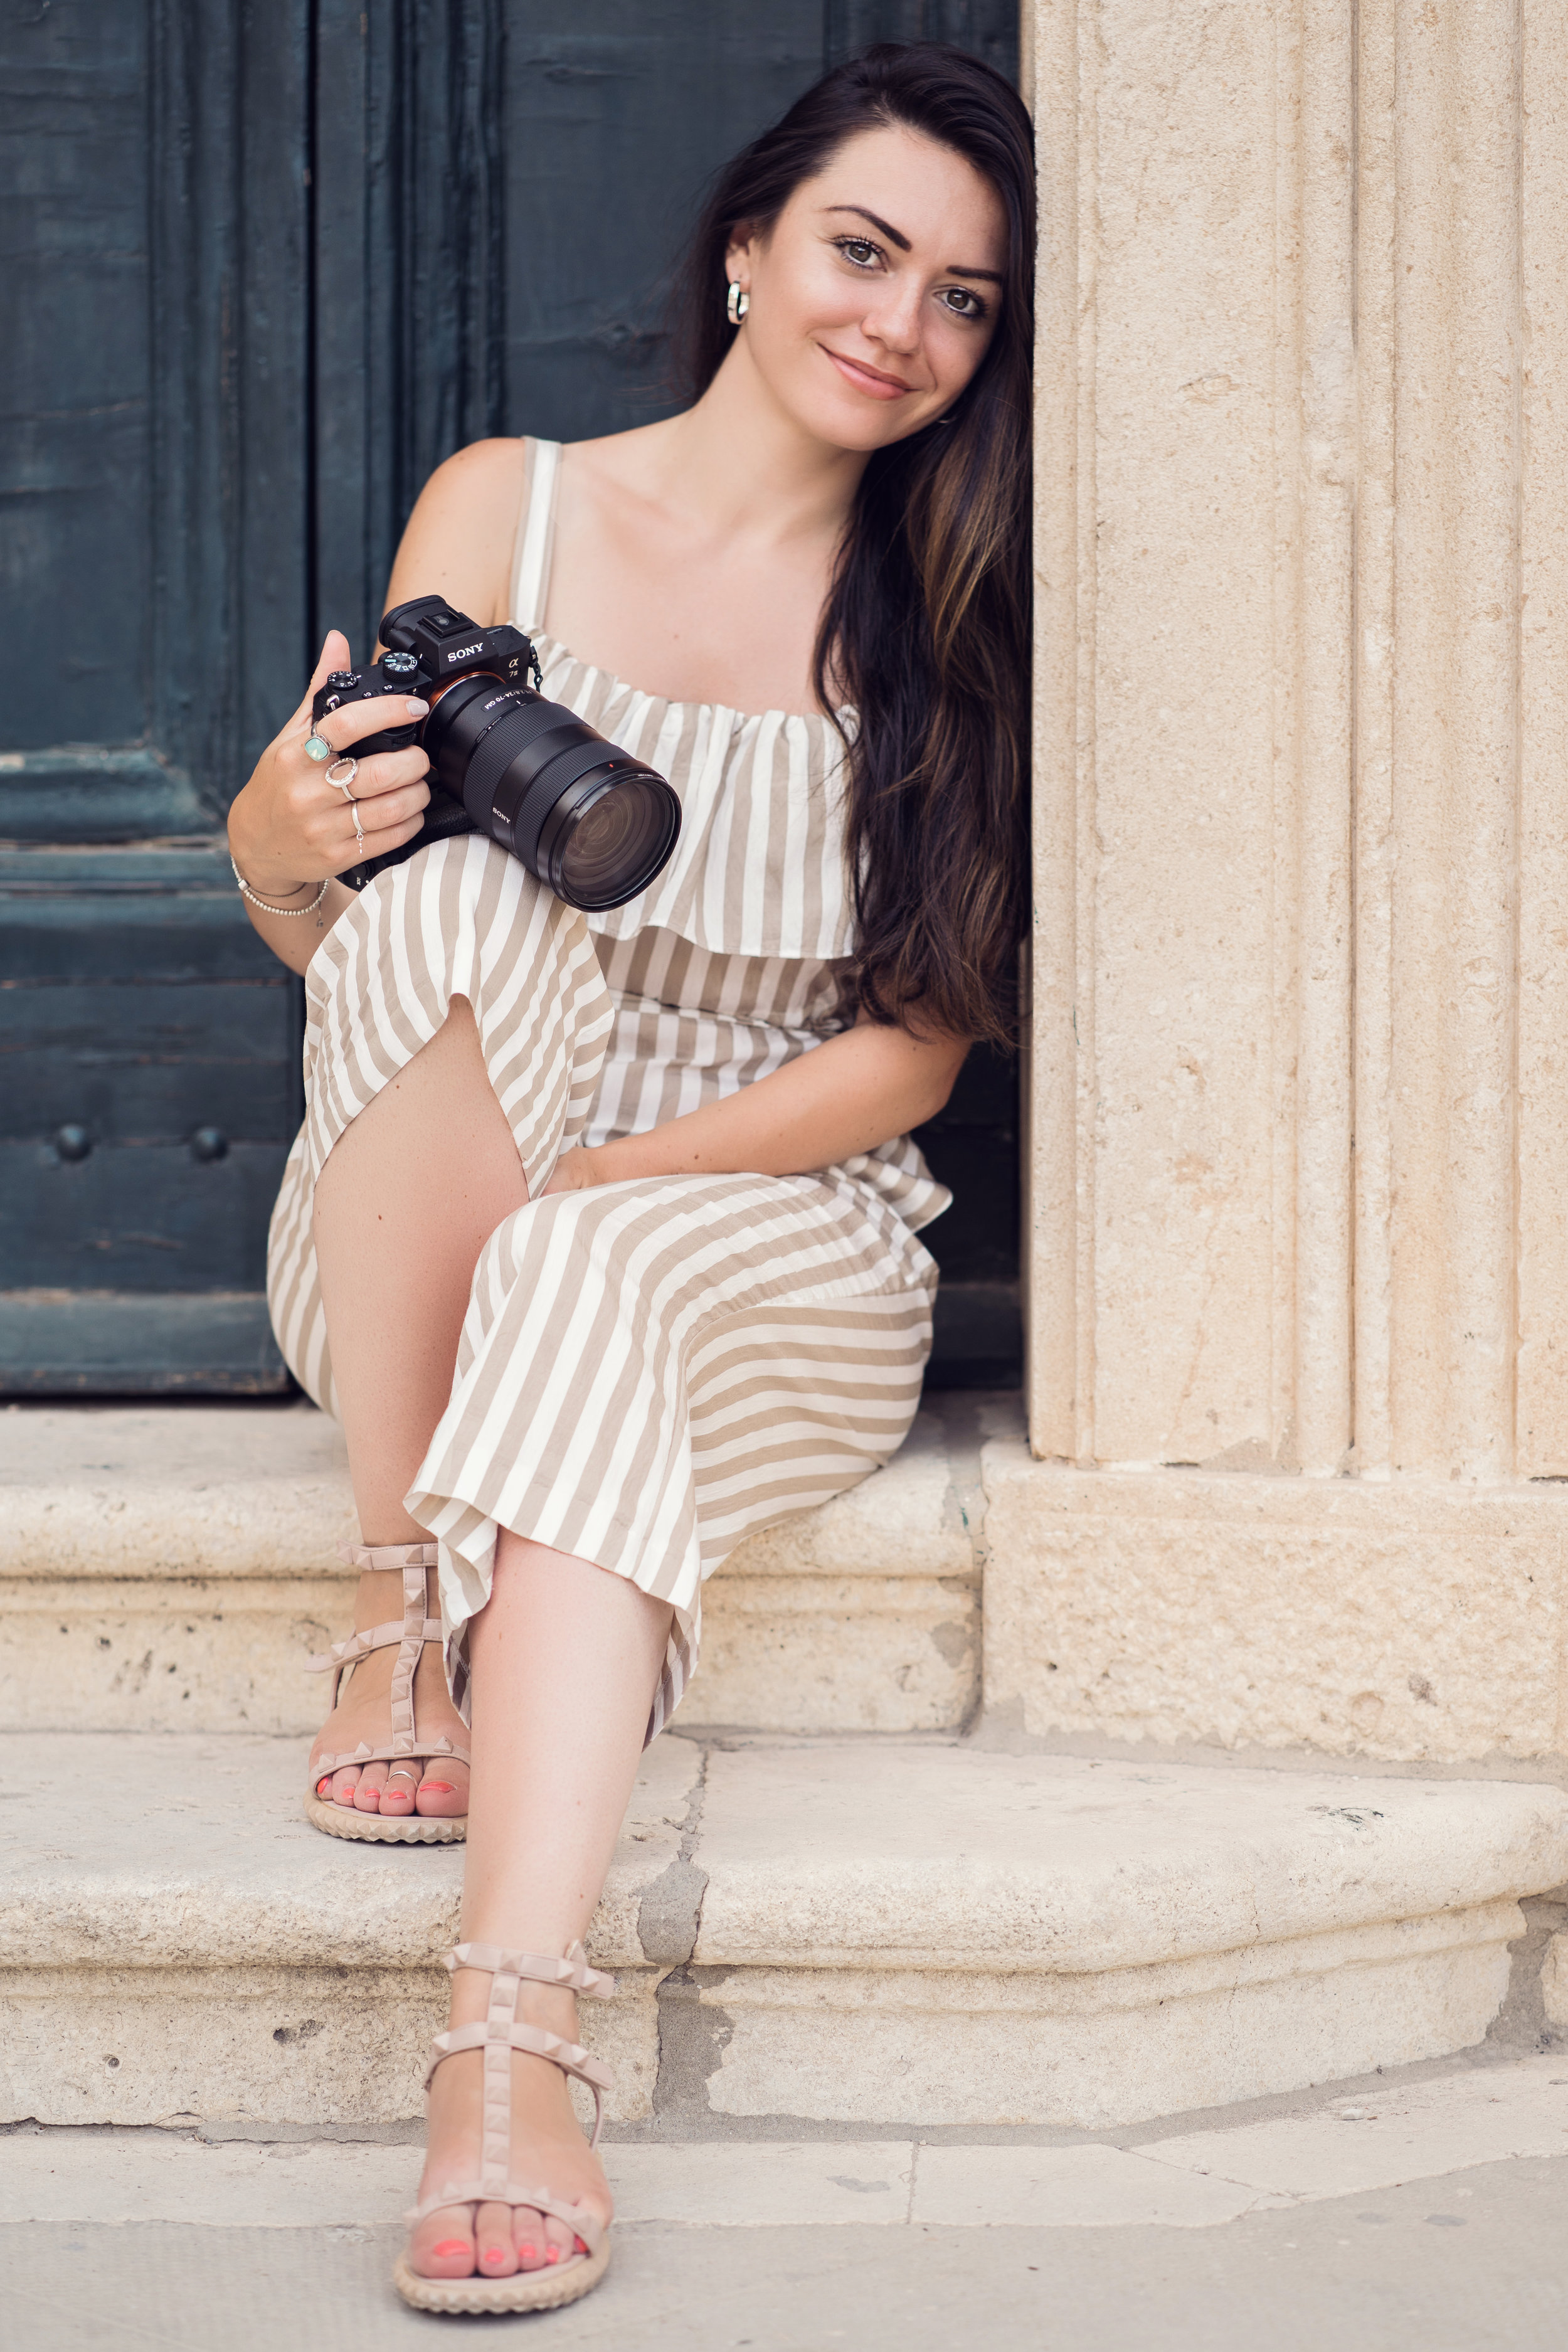 Jessica-raphael-photography-sony-a7iii-wedding-photographer